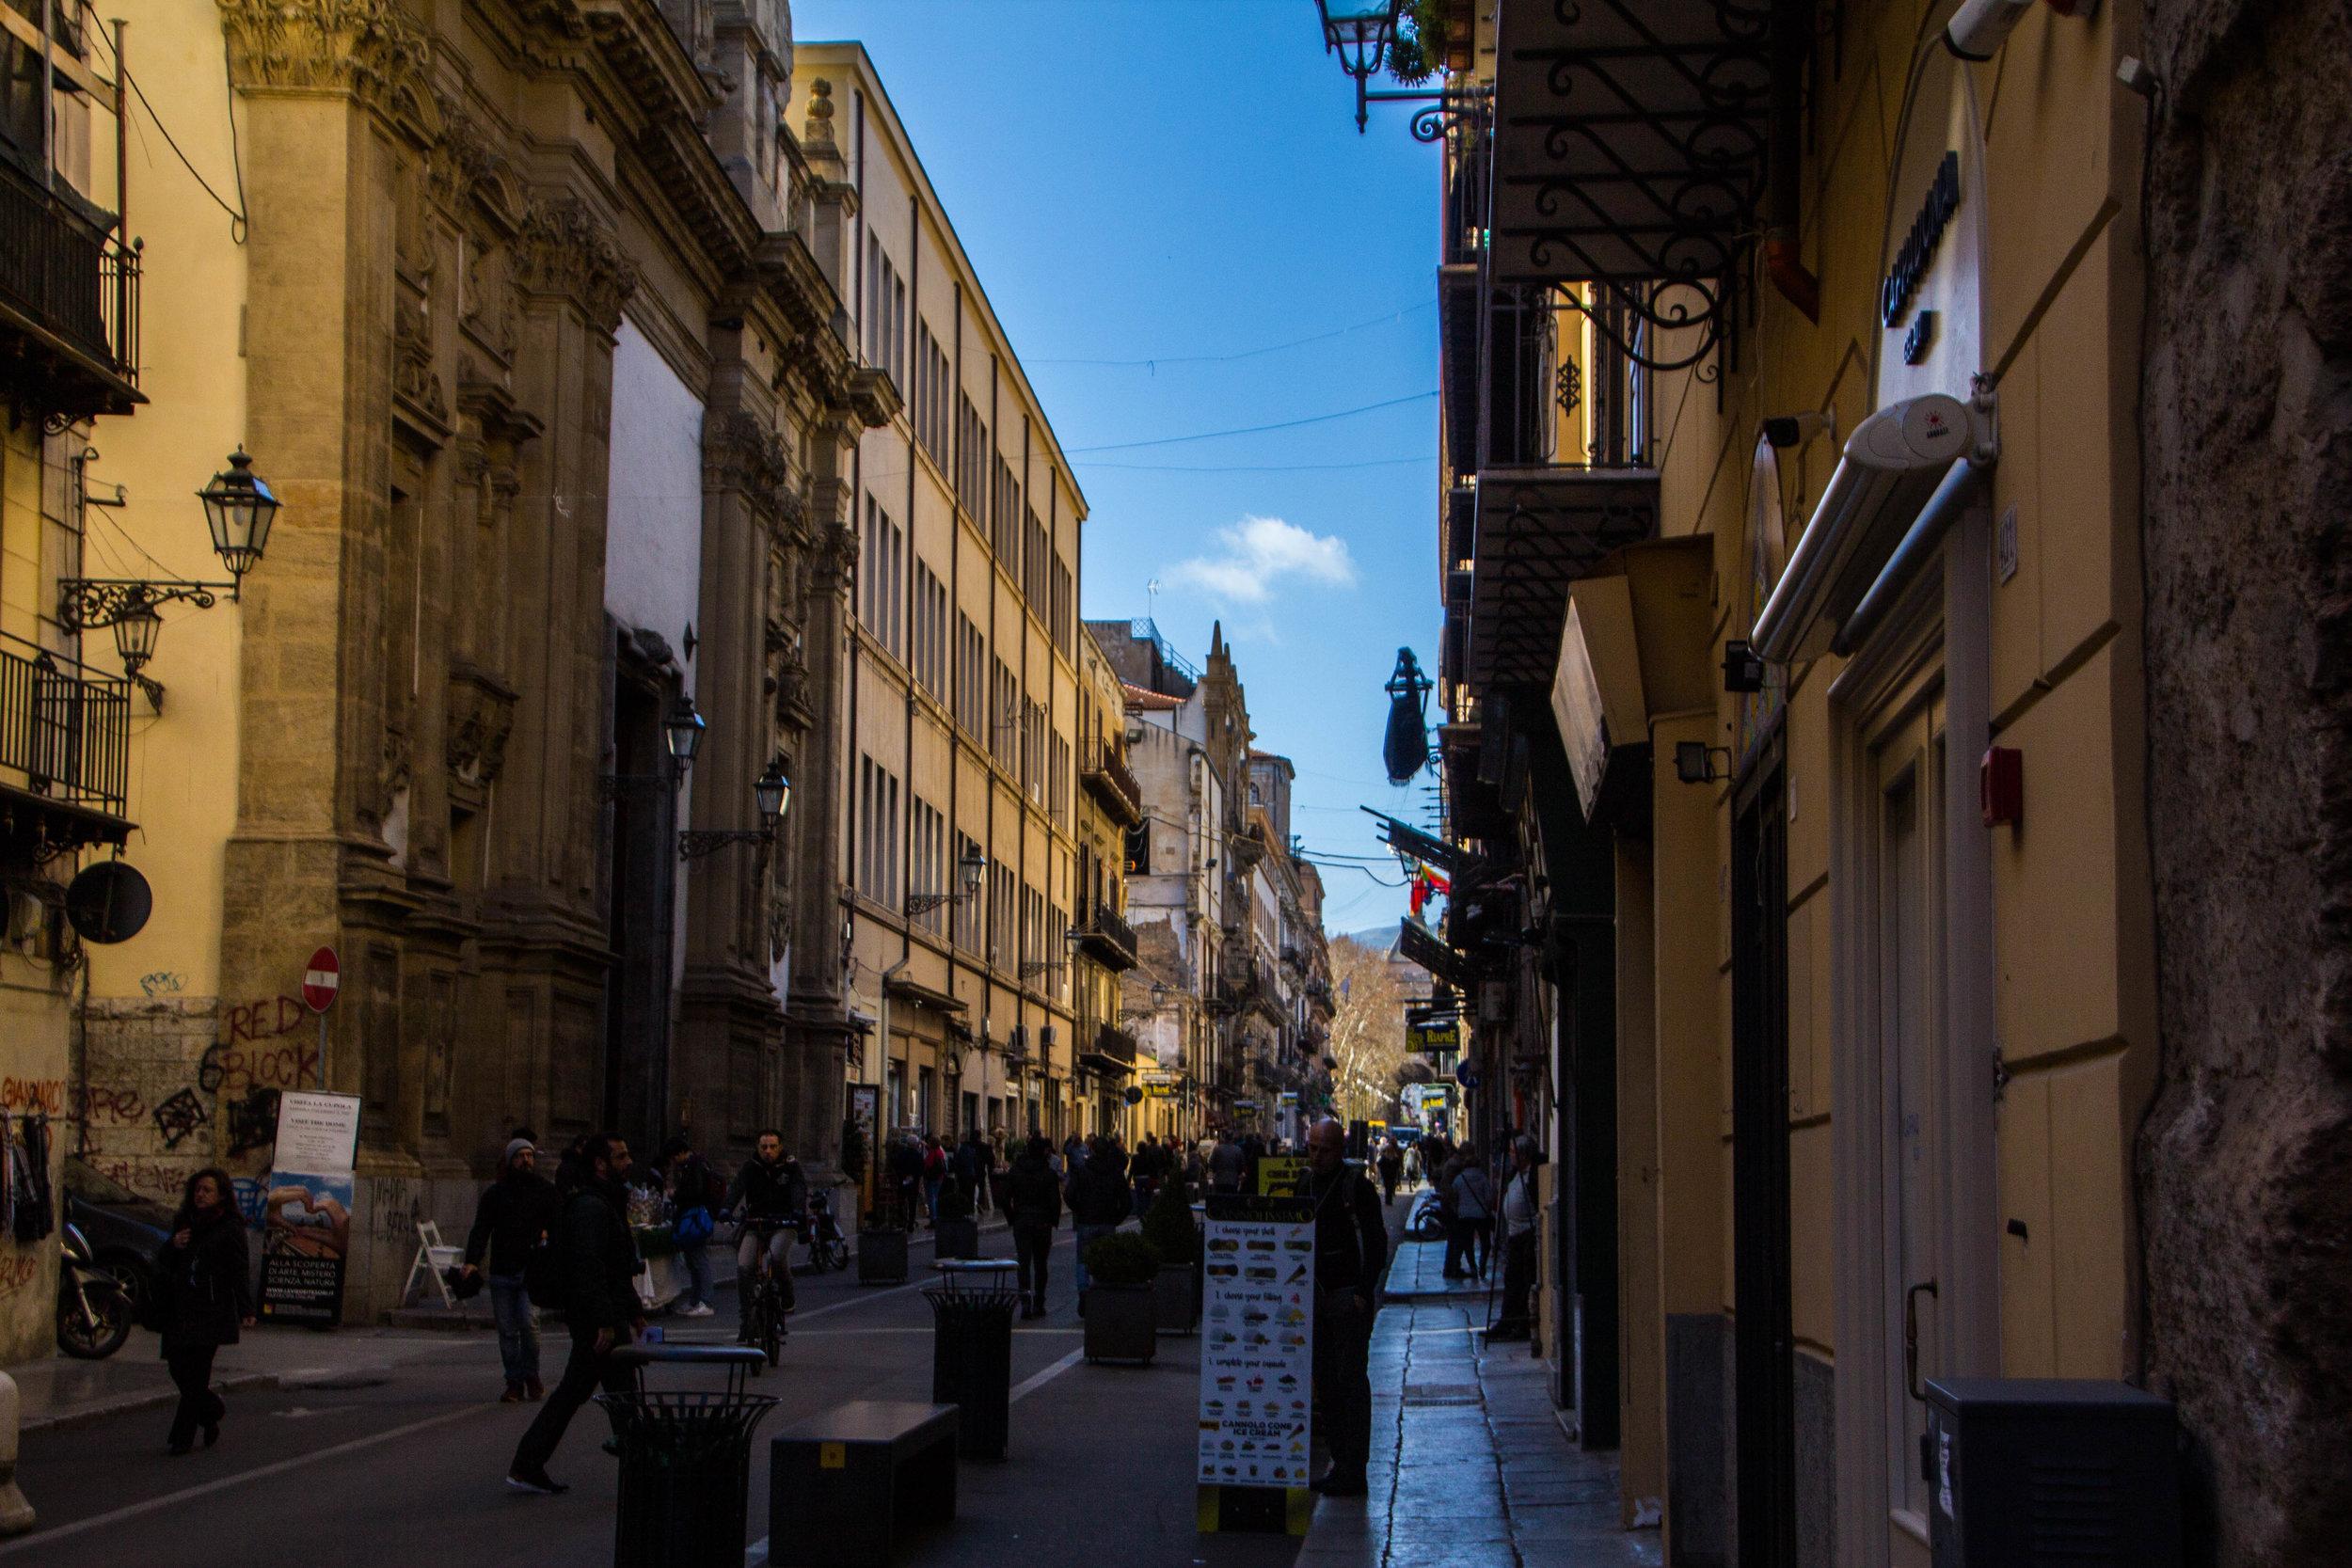 streets-palermo-sicily-2.jpg